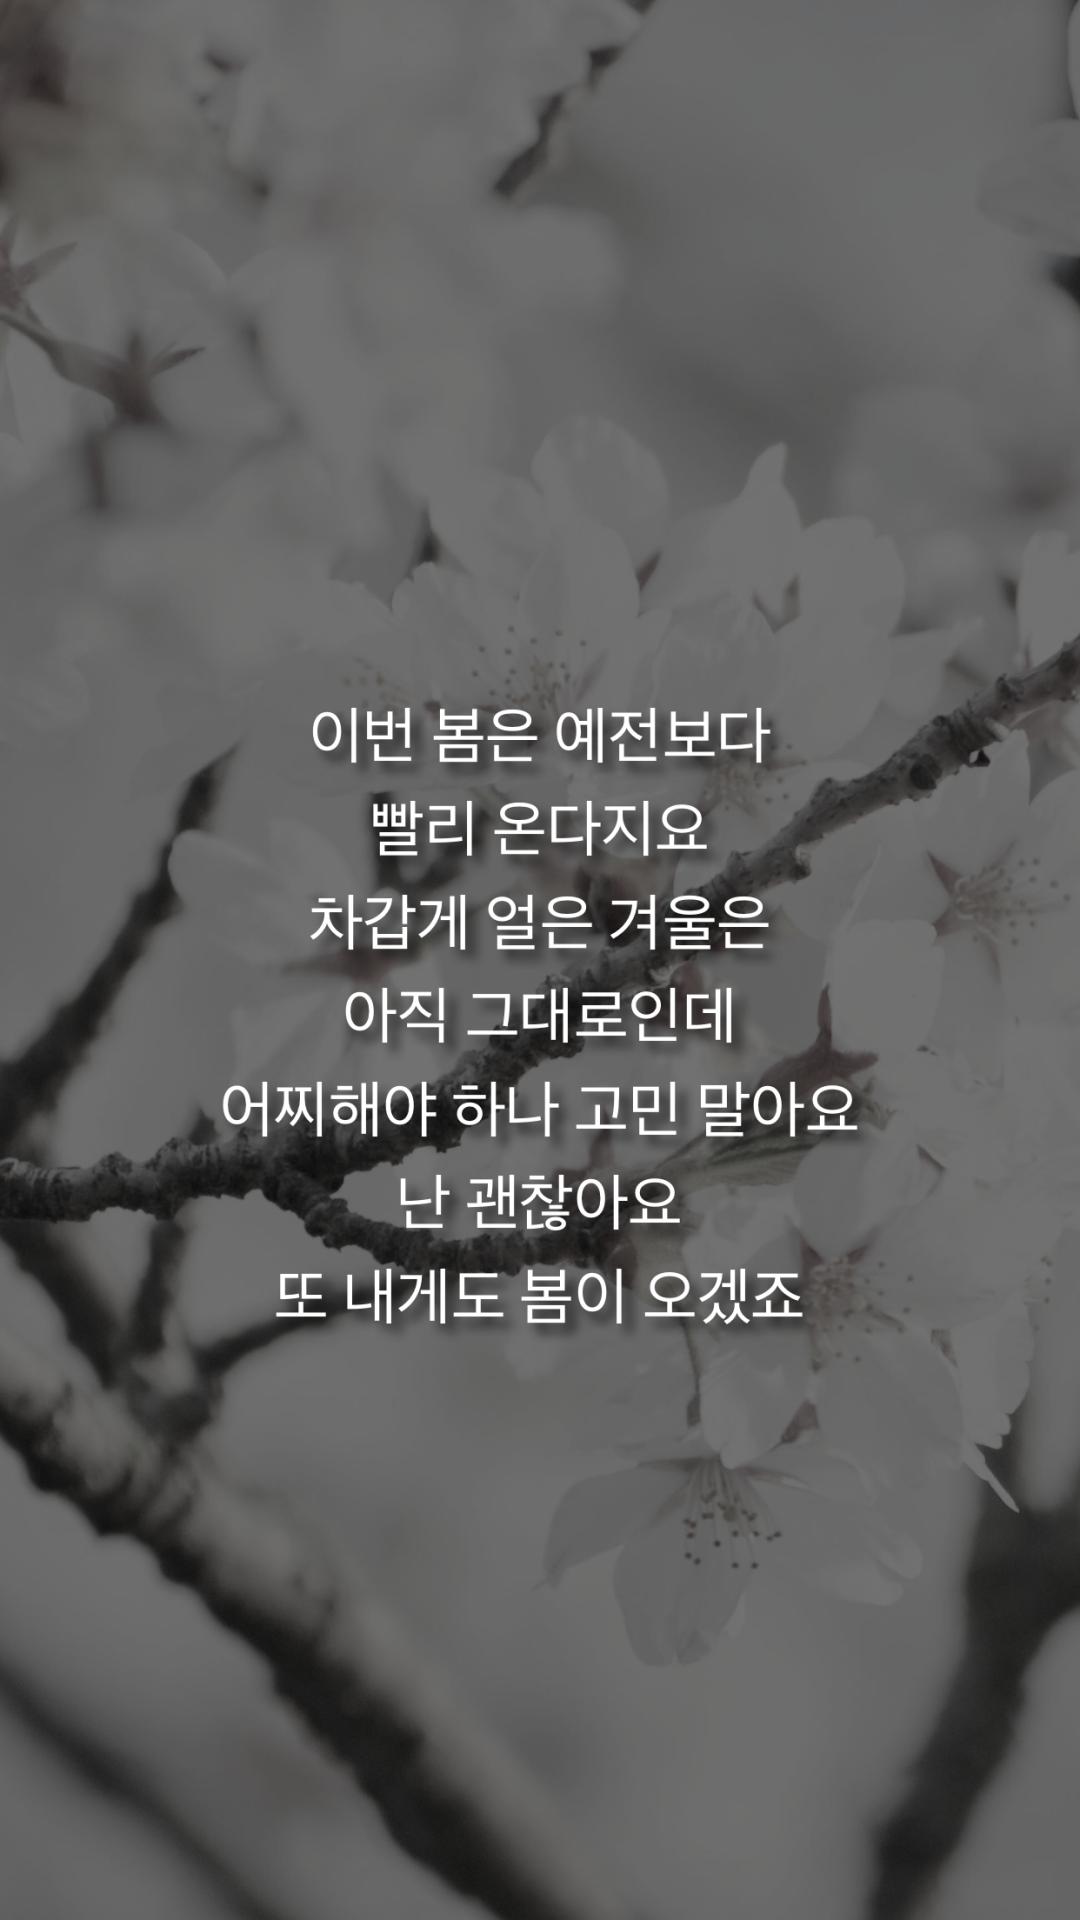 Jonghyun lyrics wallpaper tumblr